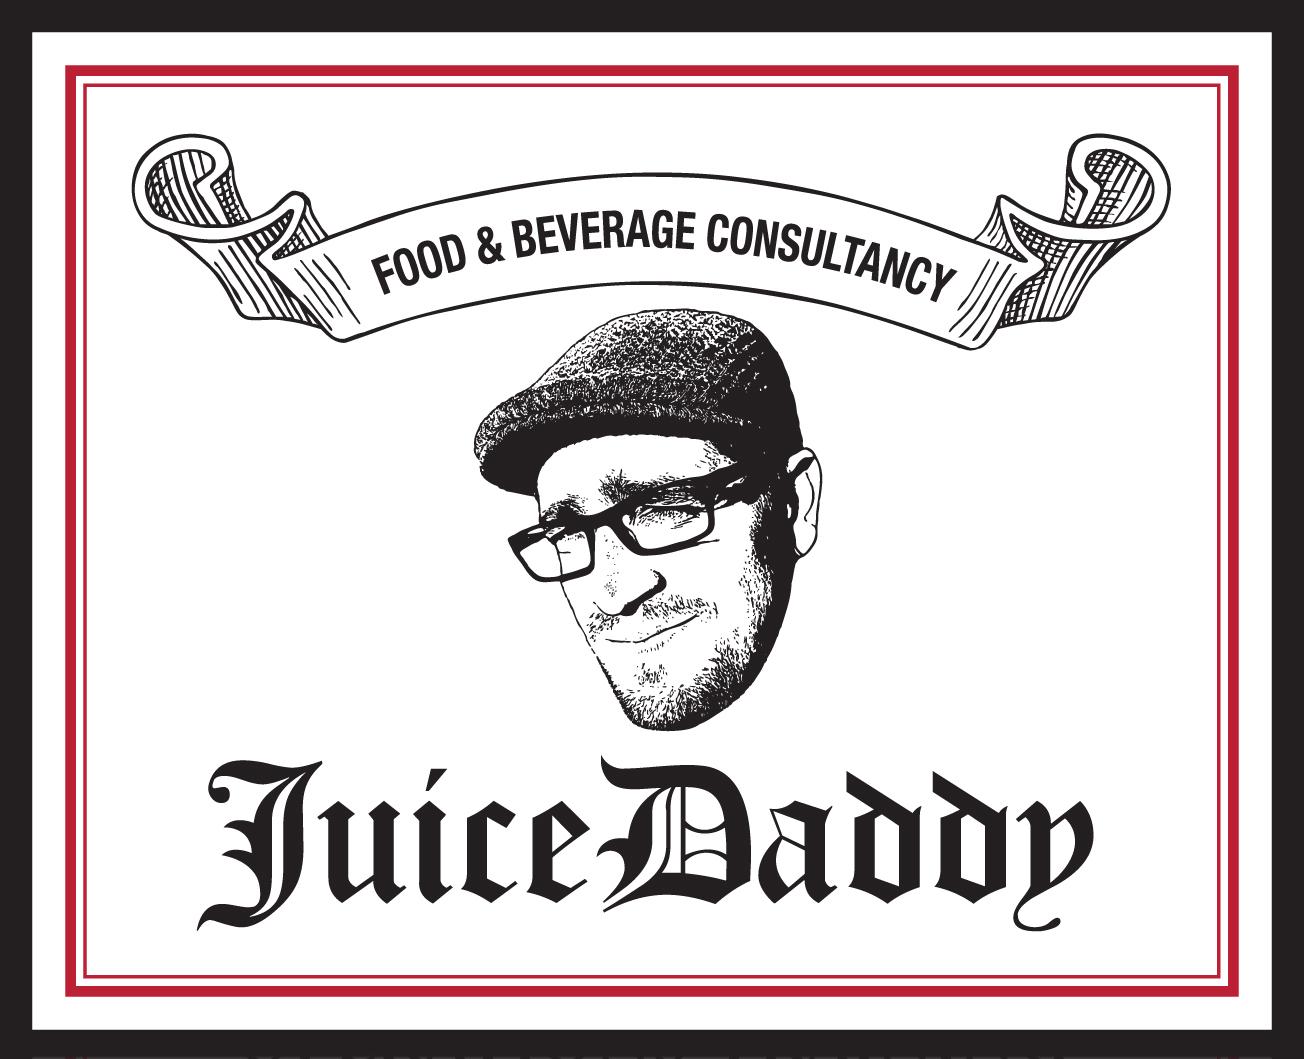 Juice Daddy Restaurant Consultant Michael Baglieri